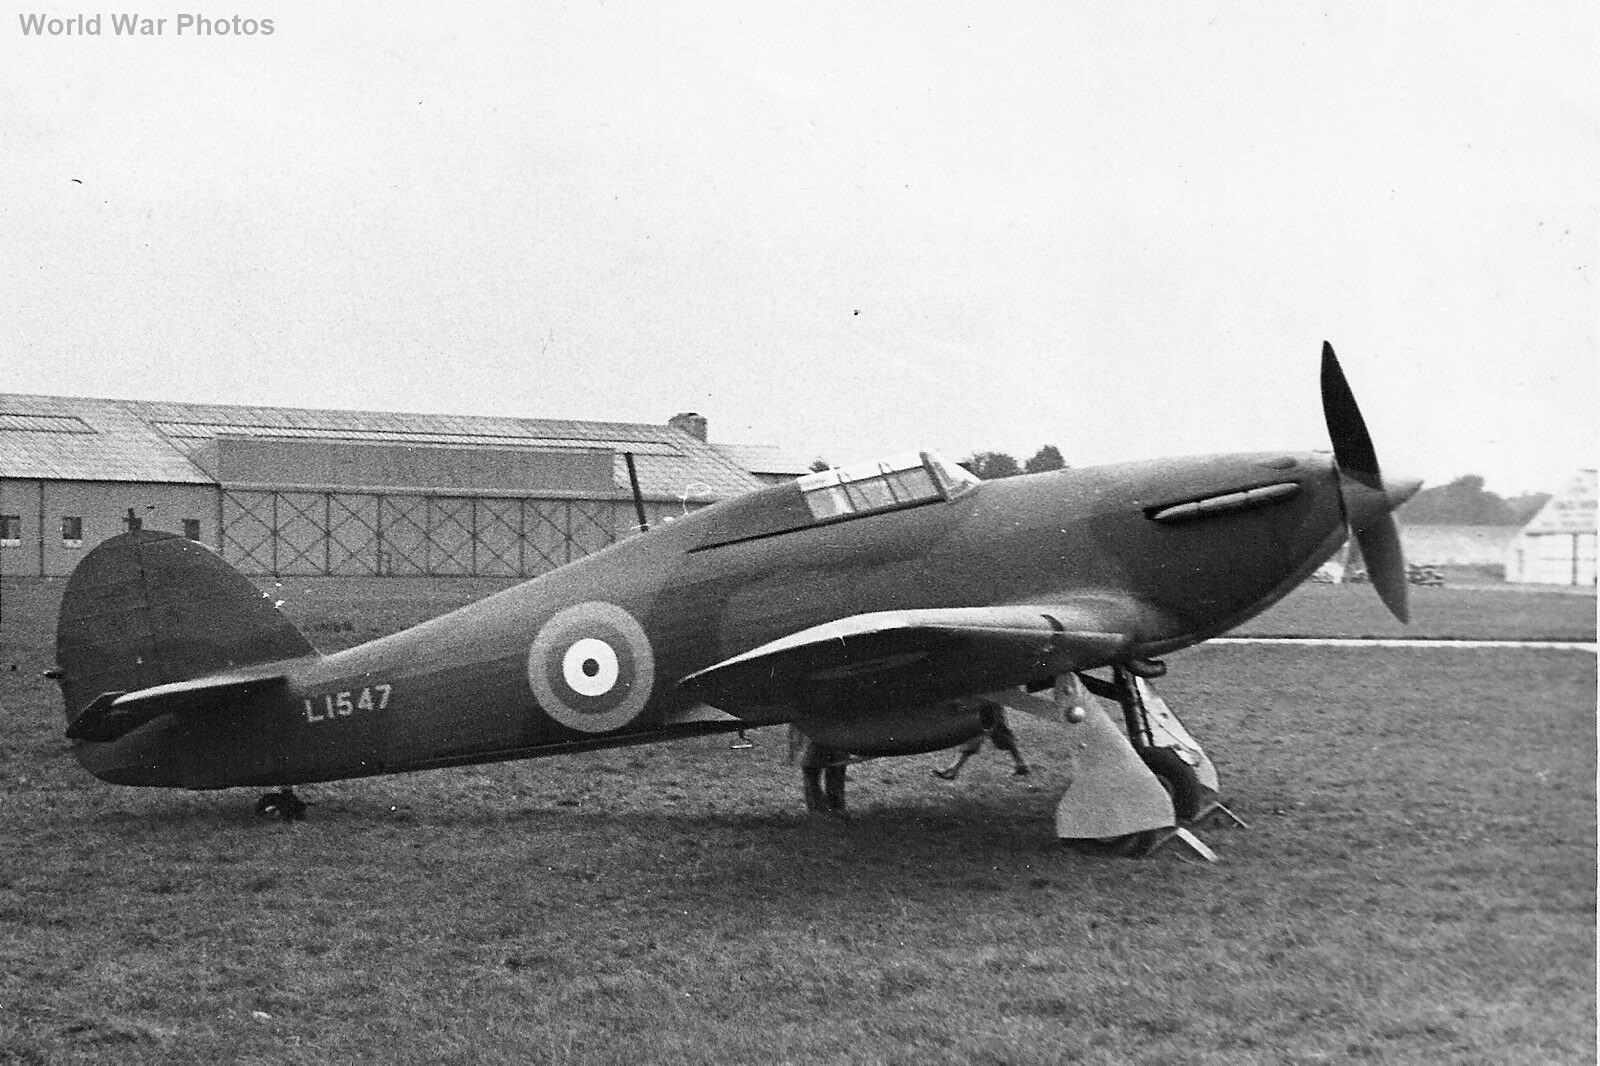 Hawker Hurricane L1547